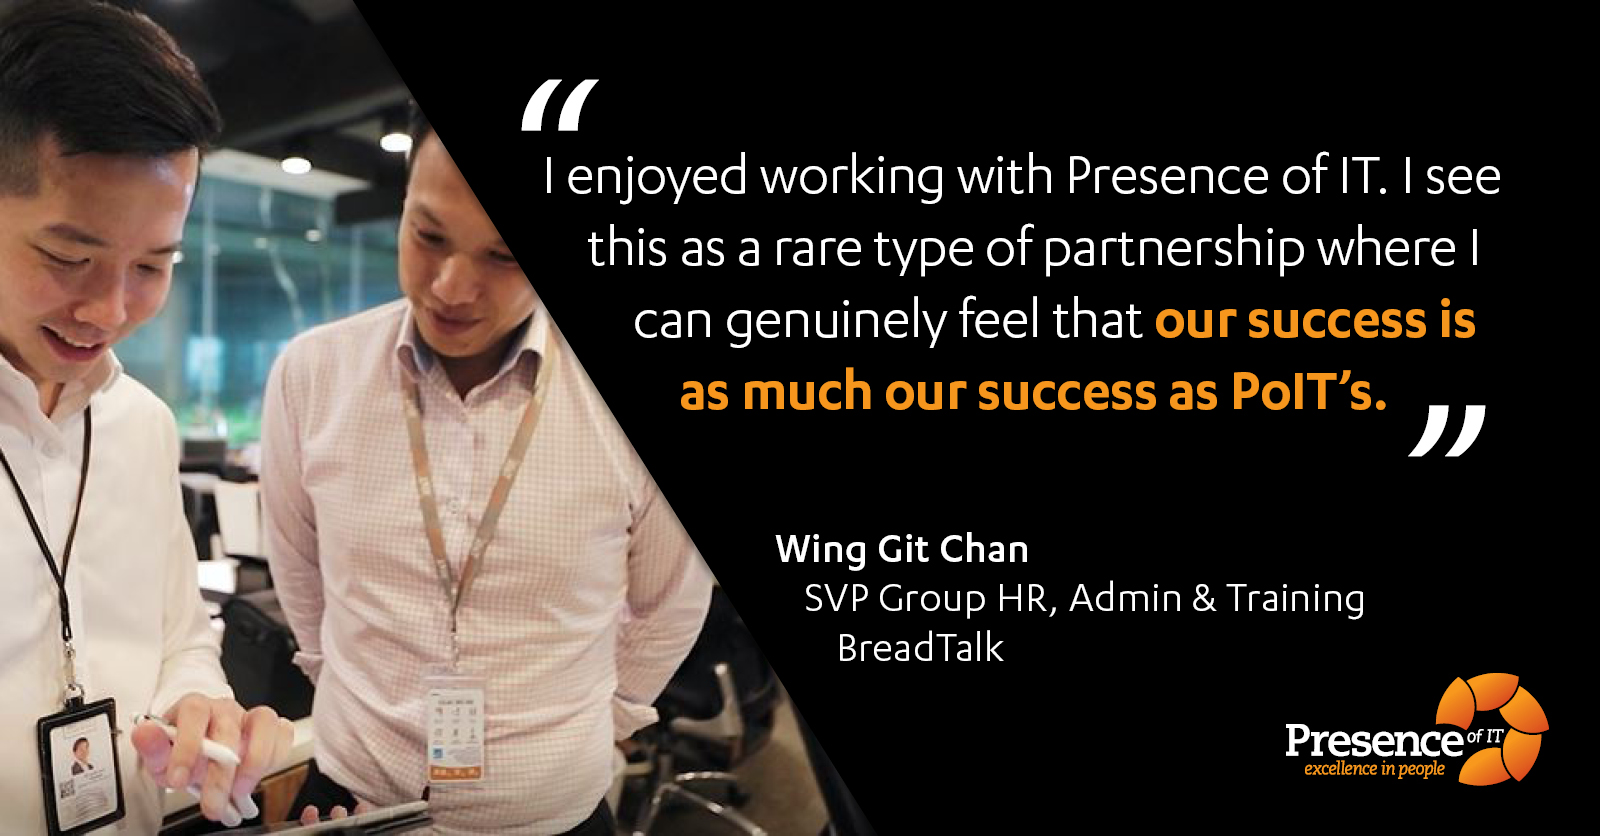 BreadTalk Client Stories4.jpg